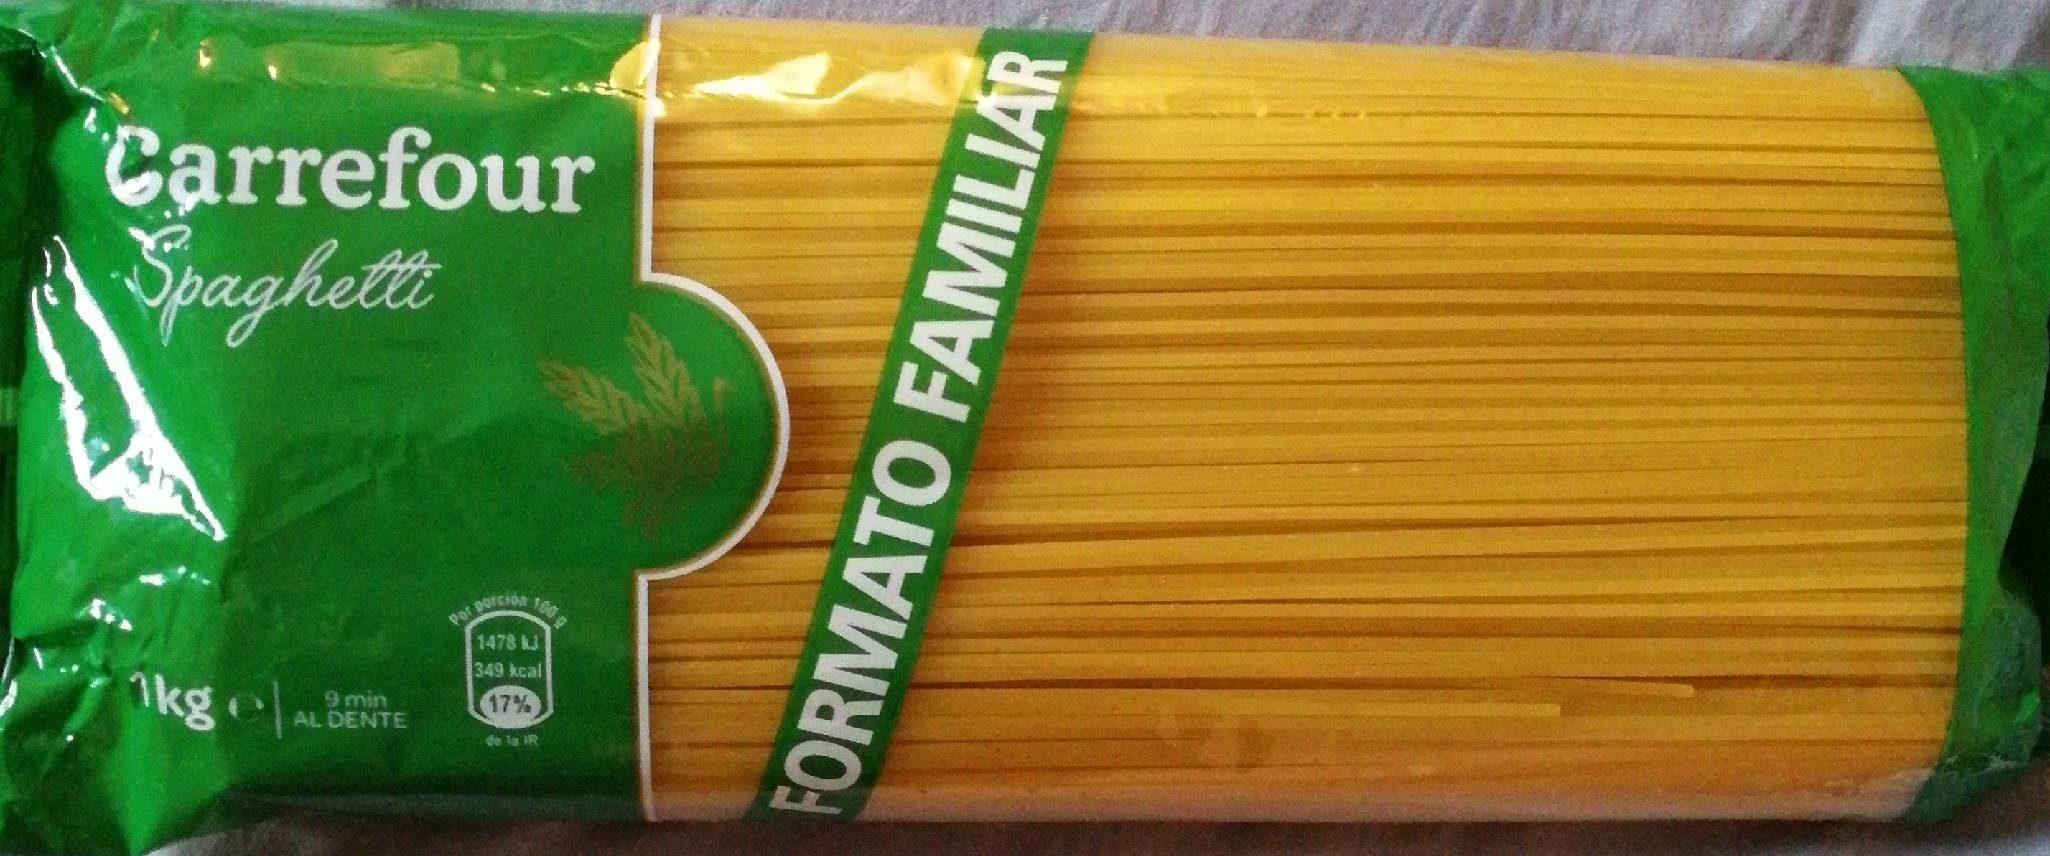 Spaghetti - Producto - fr